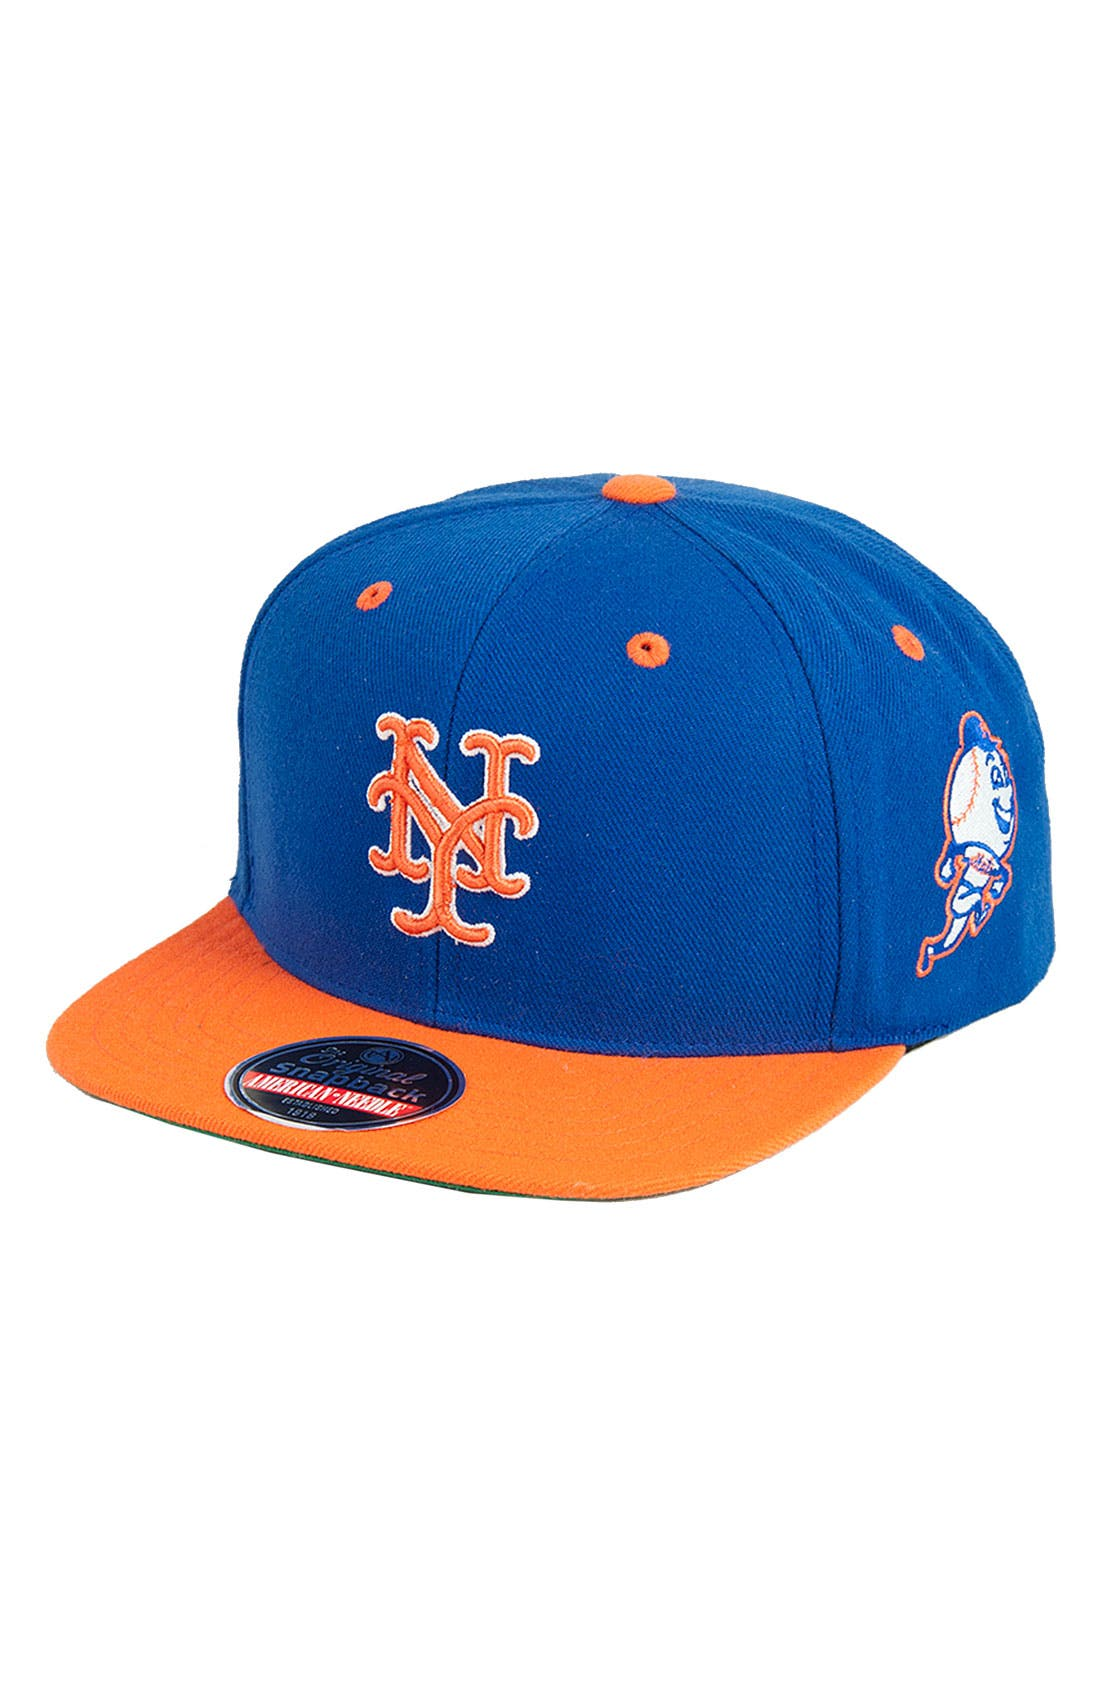 Main Image - American Needle 'Blockhead Mets' Snapback Baseball Cap